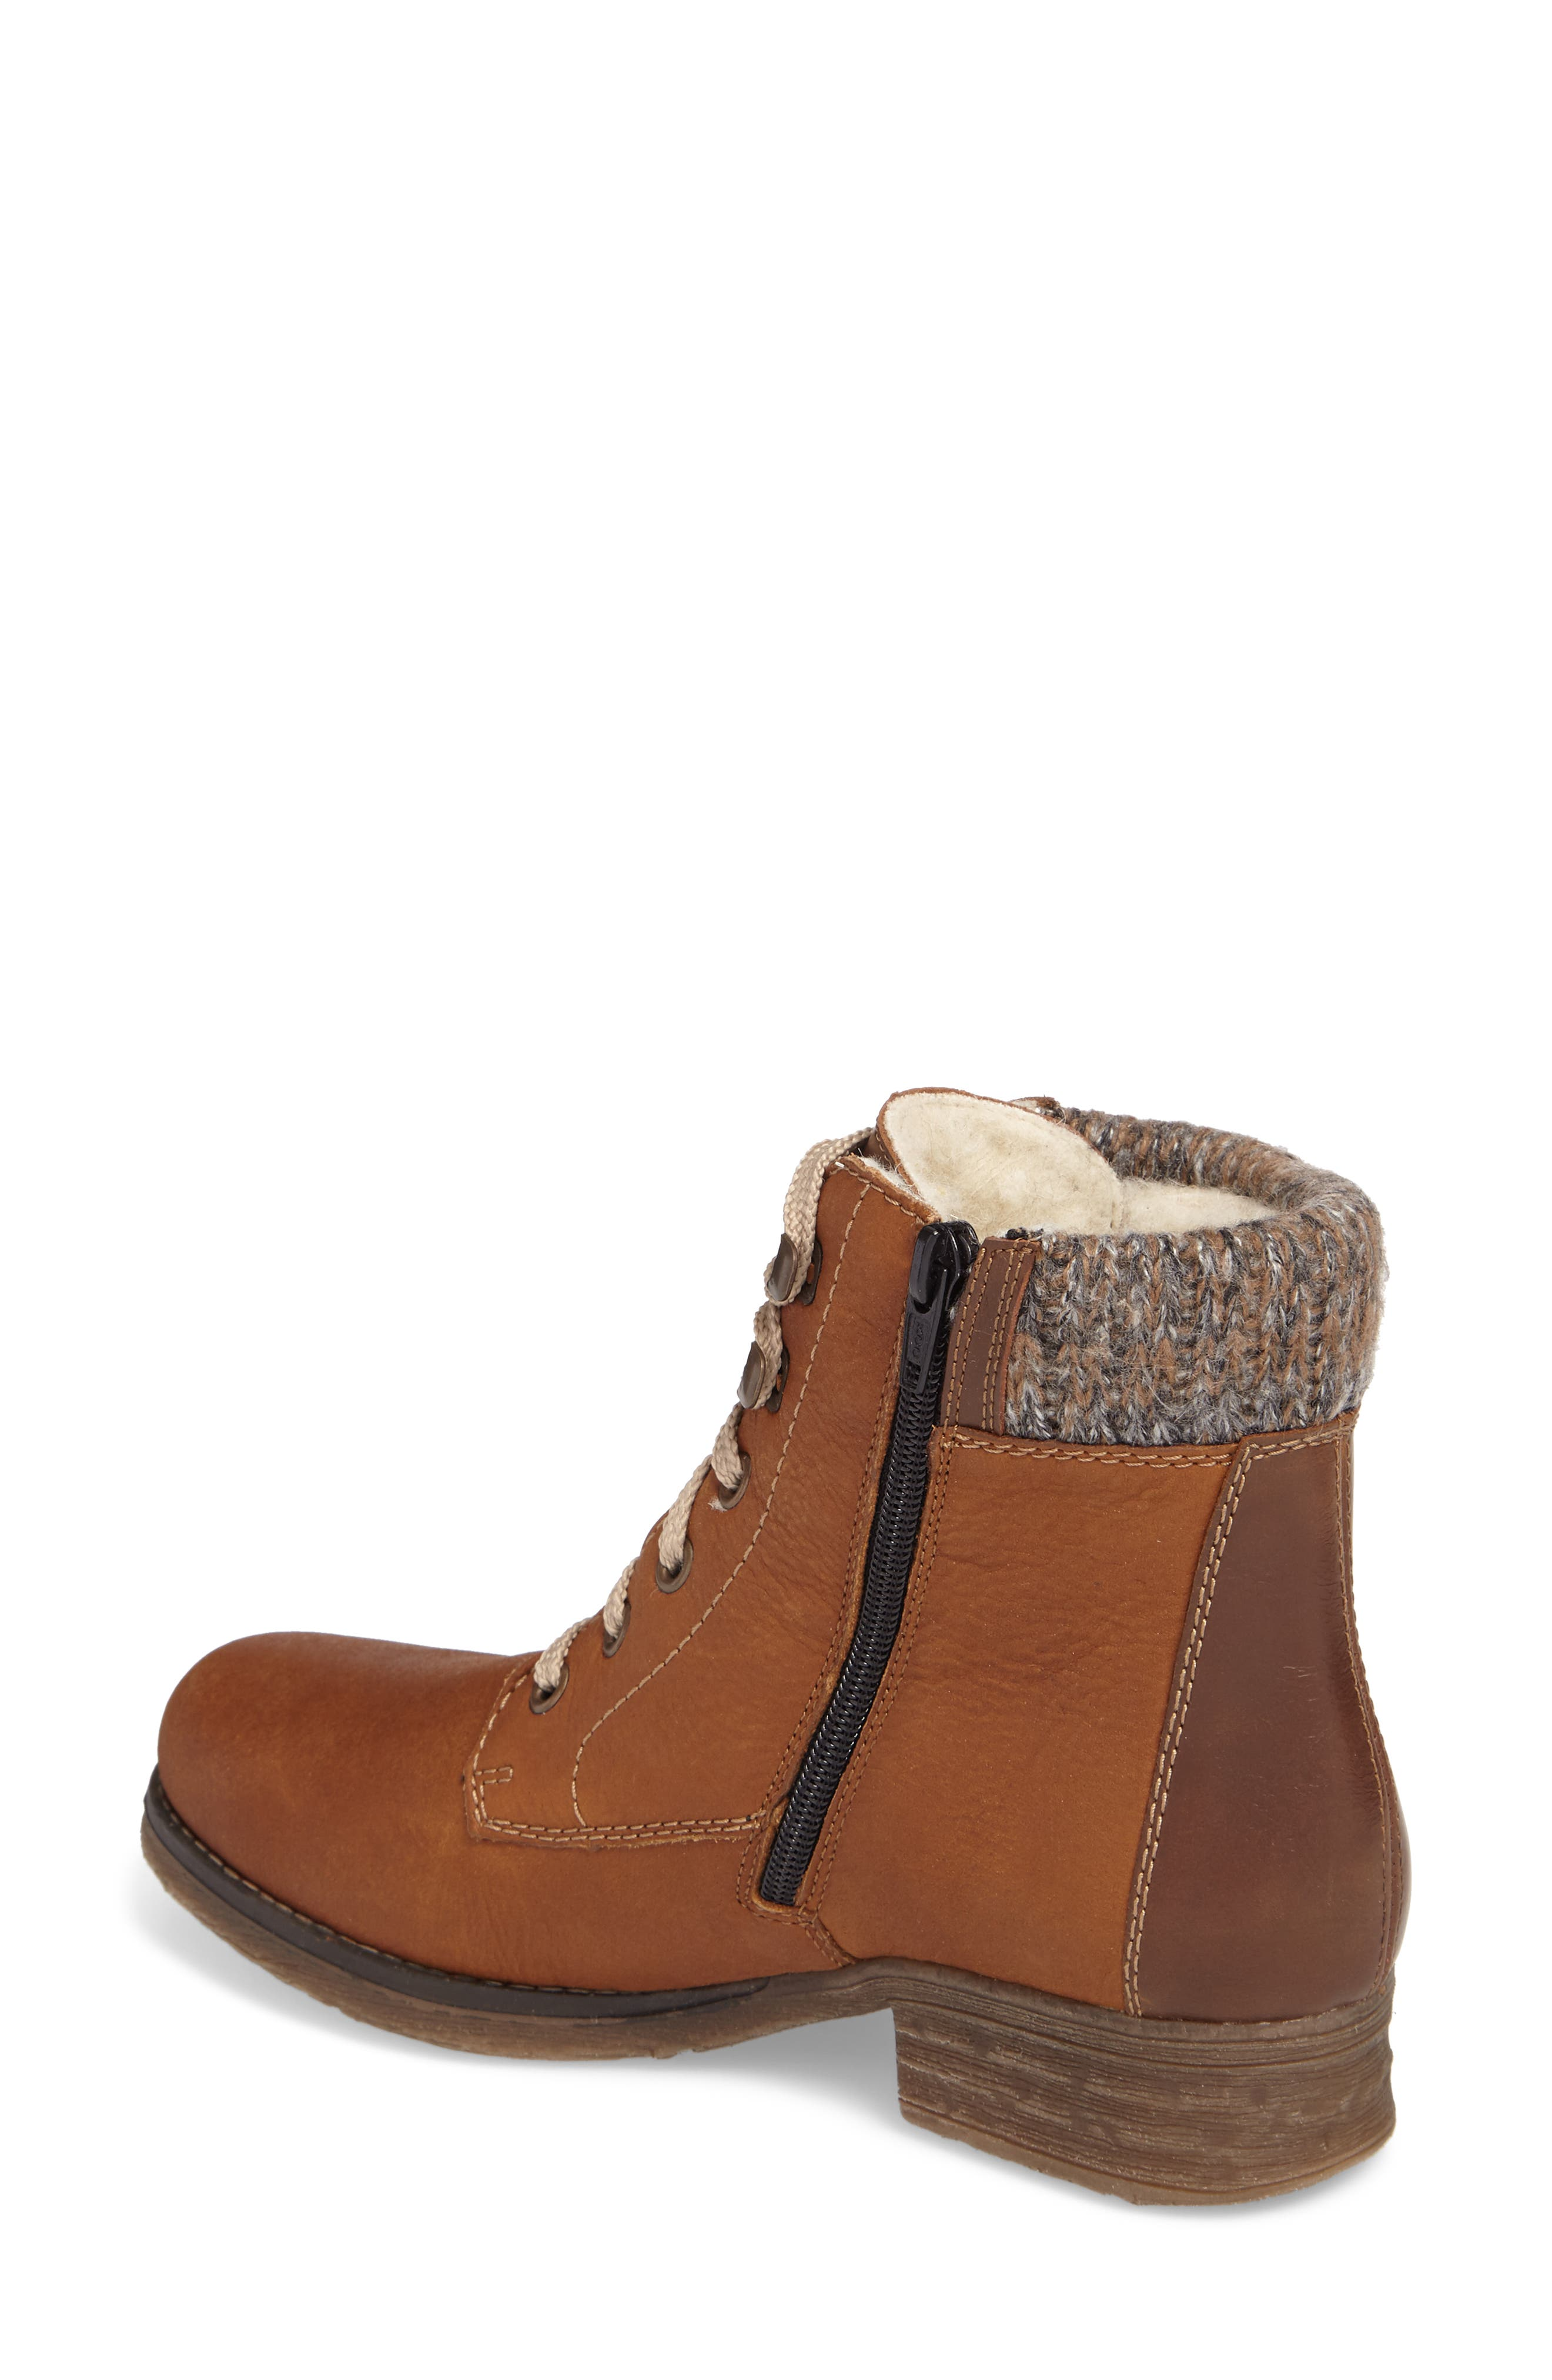 Alternate Image 2  - Rieker Antistress Fee 02 Lace-Up Boot (Women)